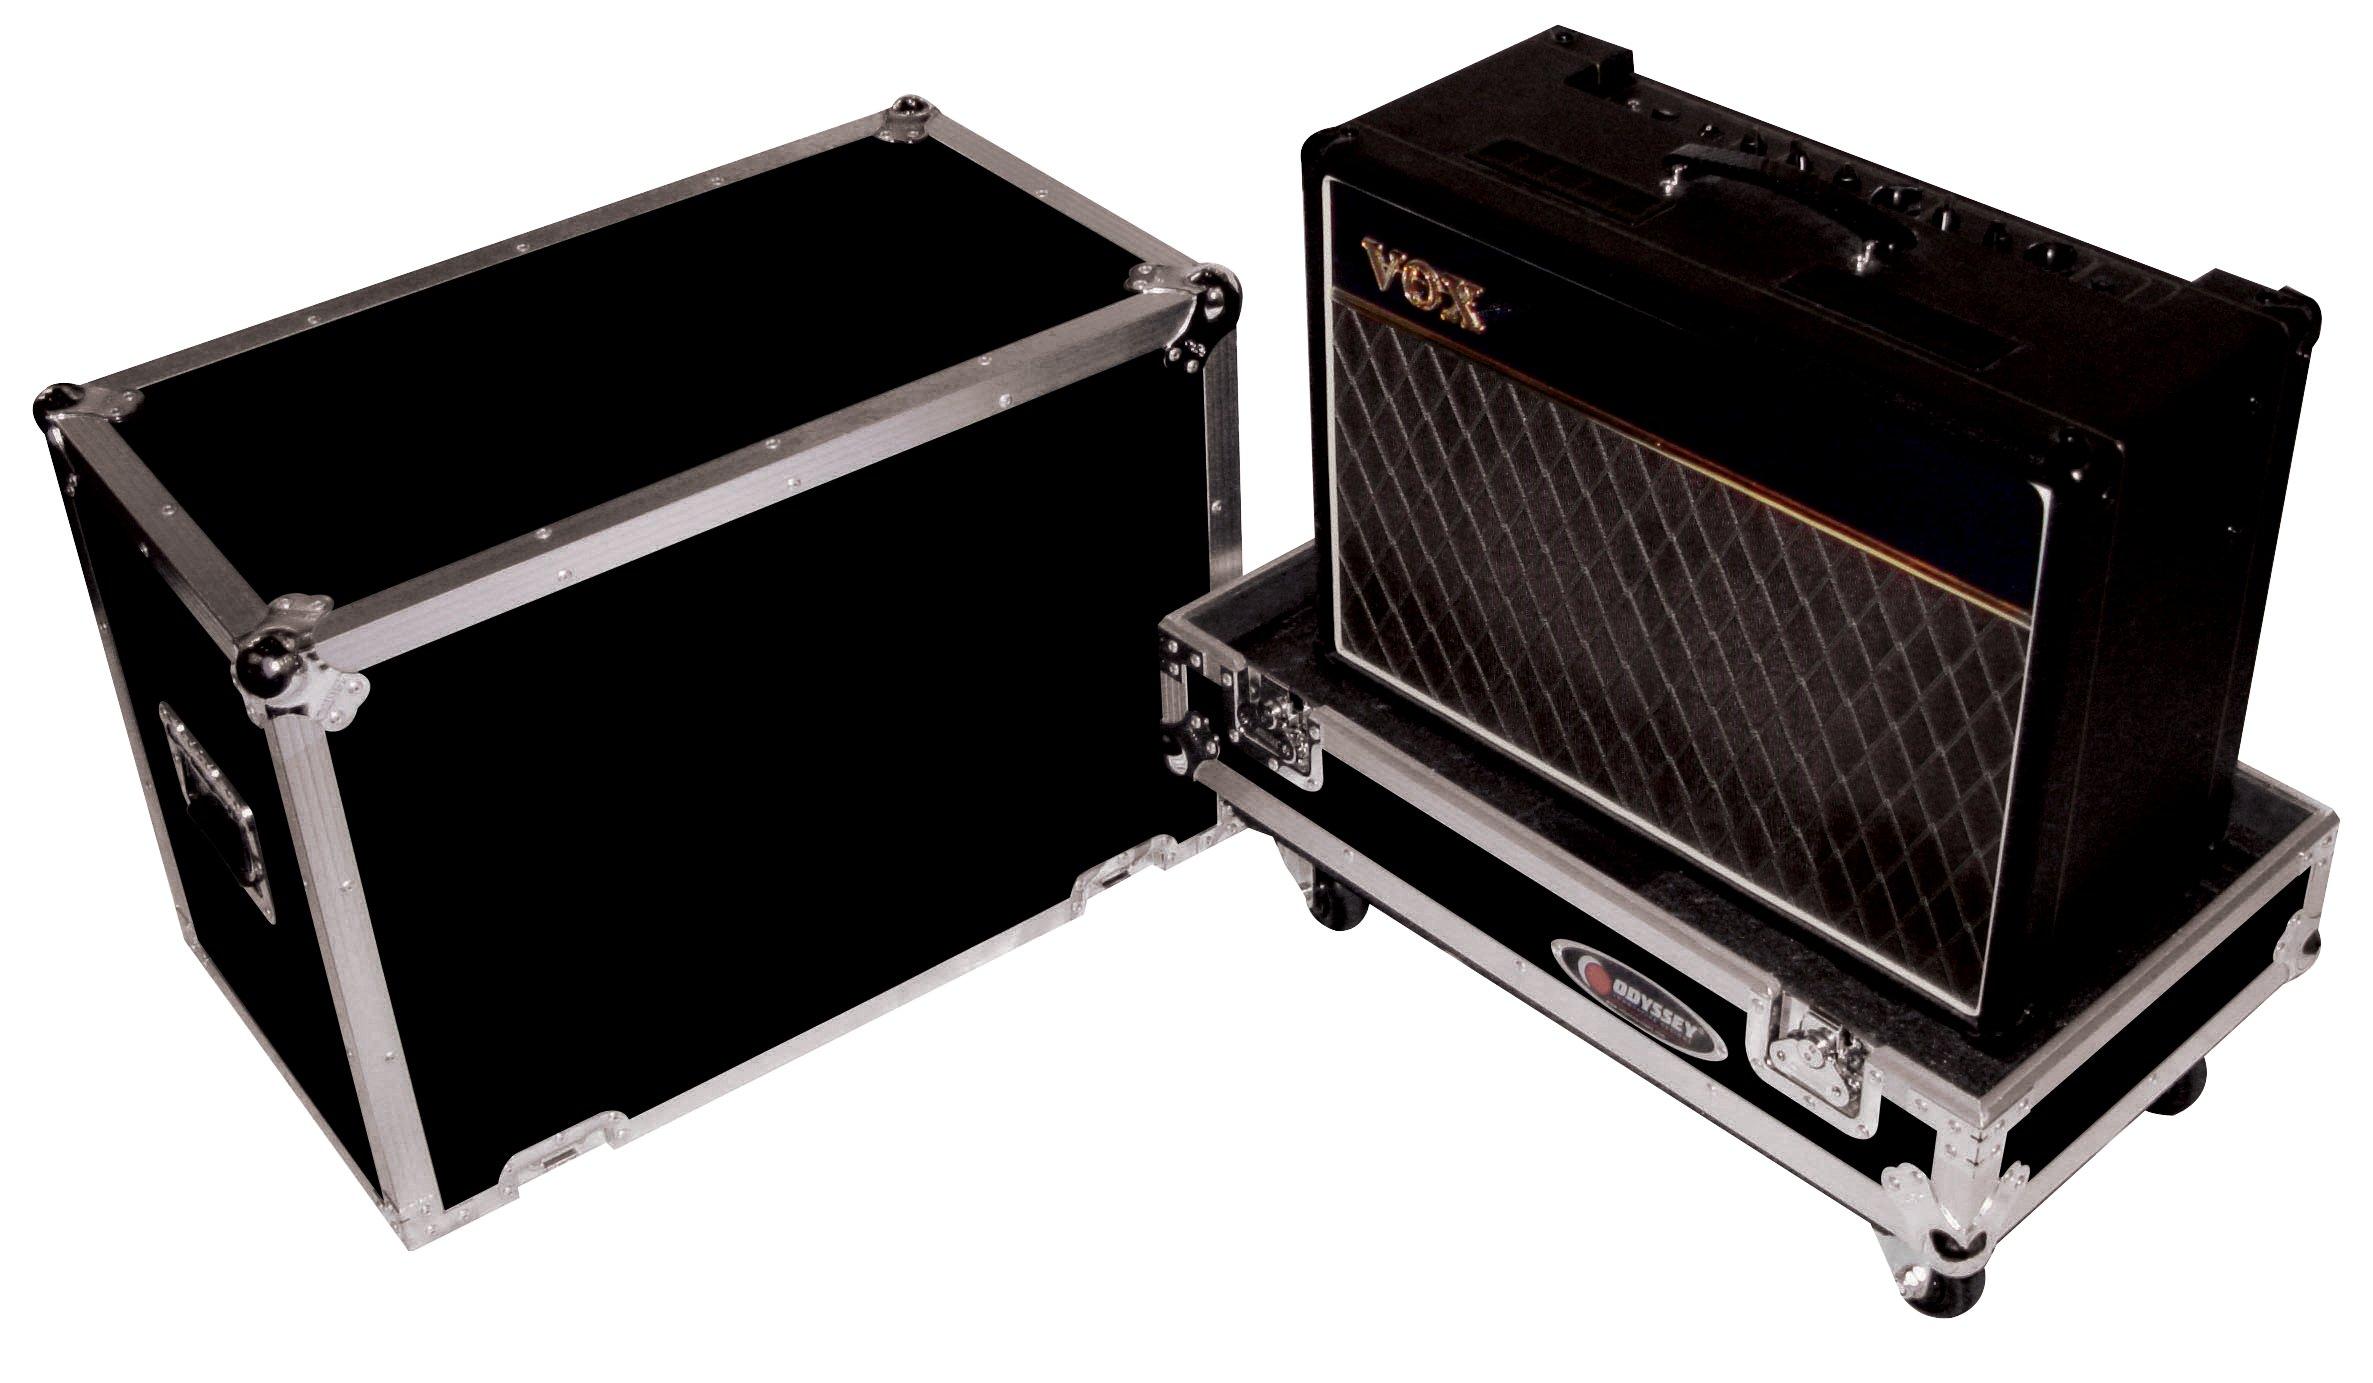 Odyssey FZGC112W Flight Zone 1 X 12 Speaker Guitar Combo Amp Ata Case With Wheels